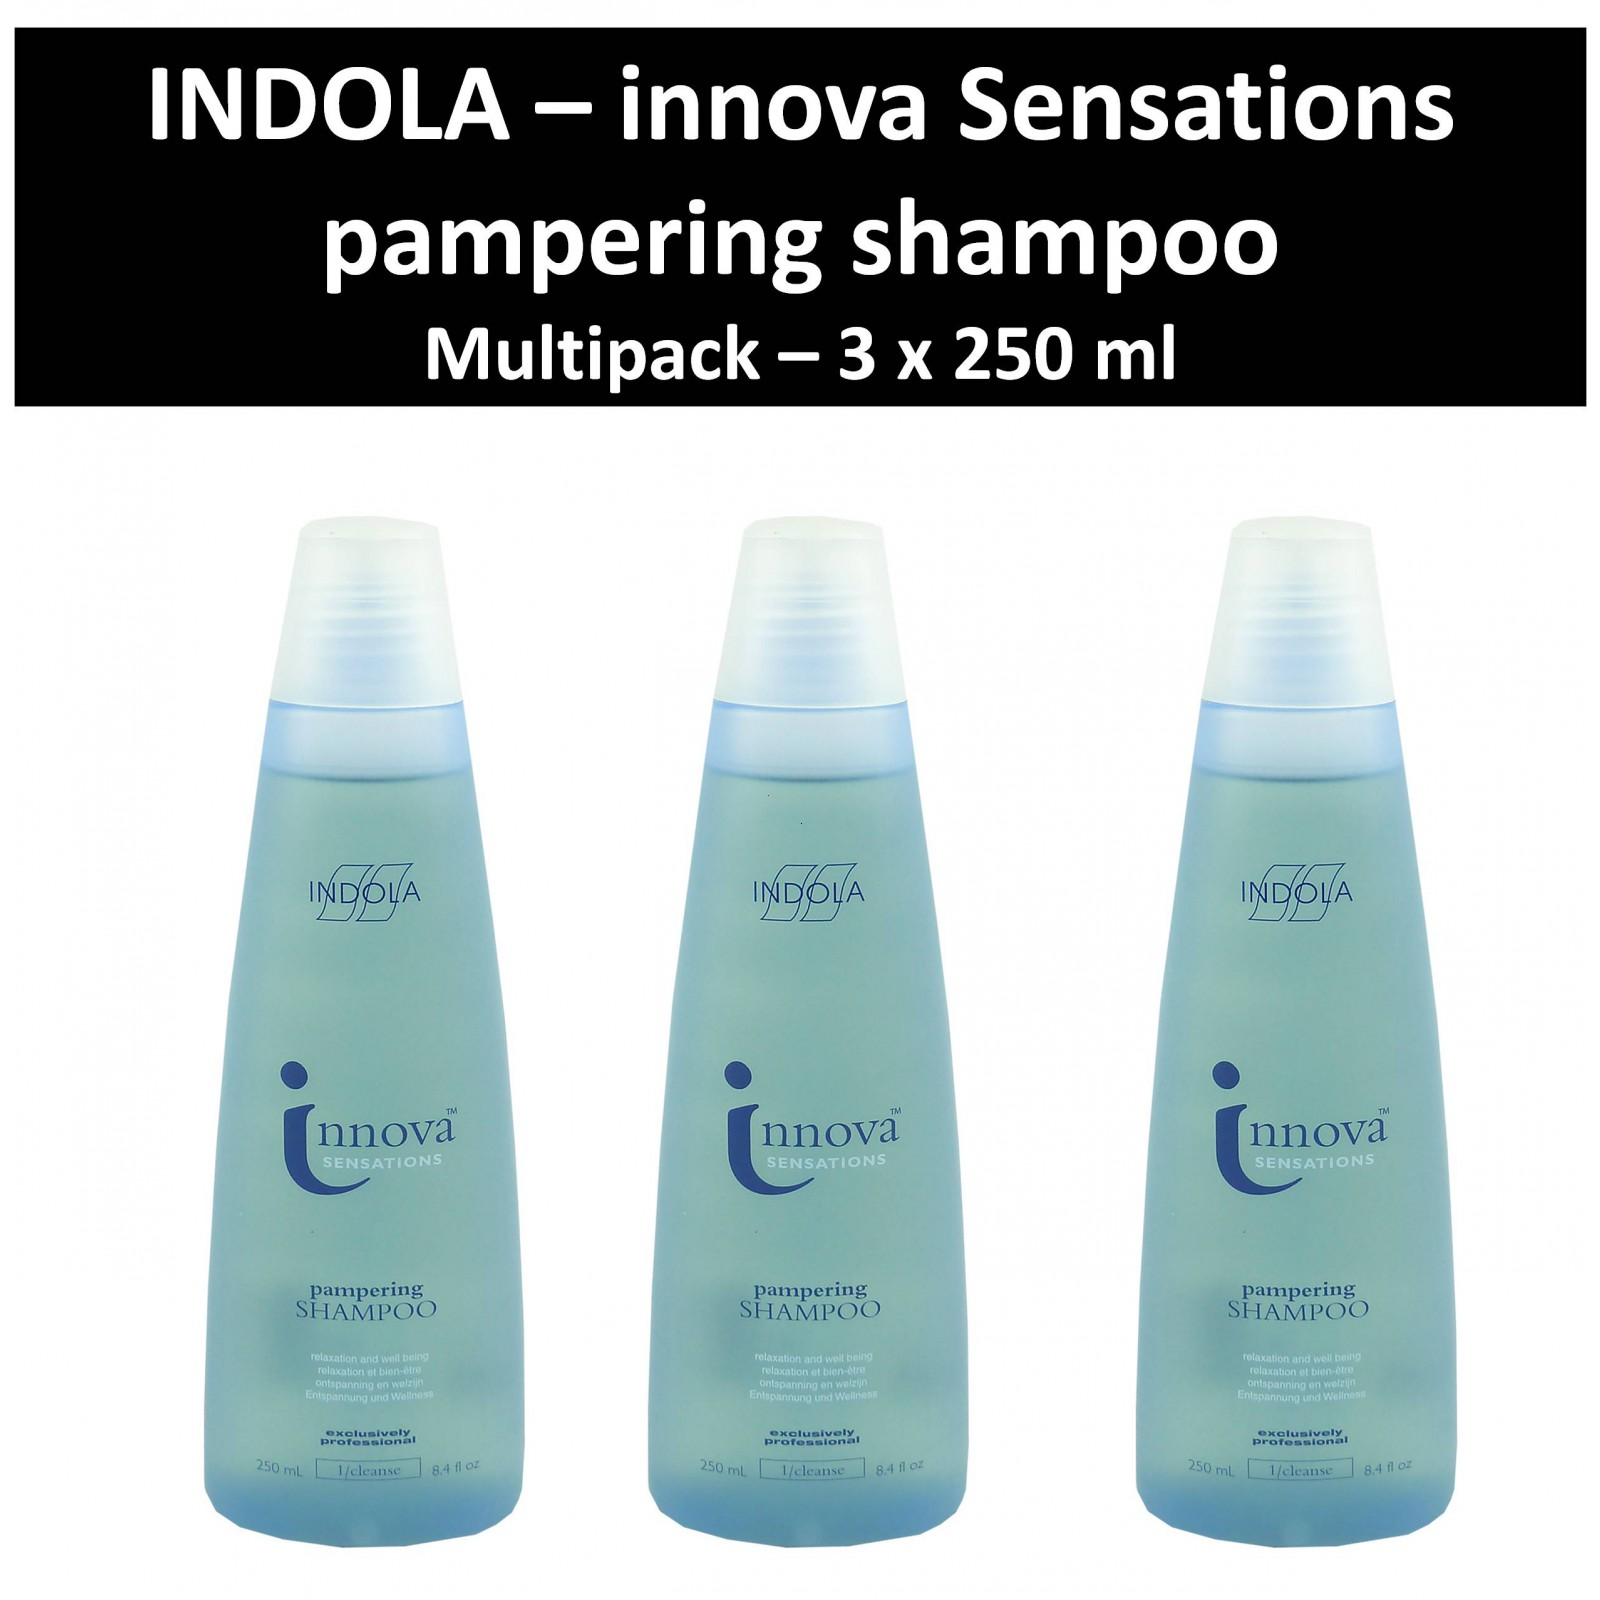 Indola - Innova Sensations - Pampering Shampoo - Haar Pflege Wäsche - 3x250 ml